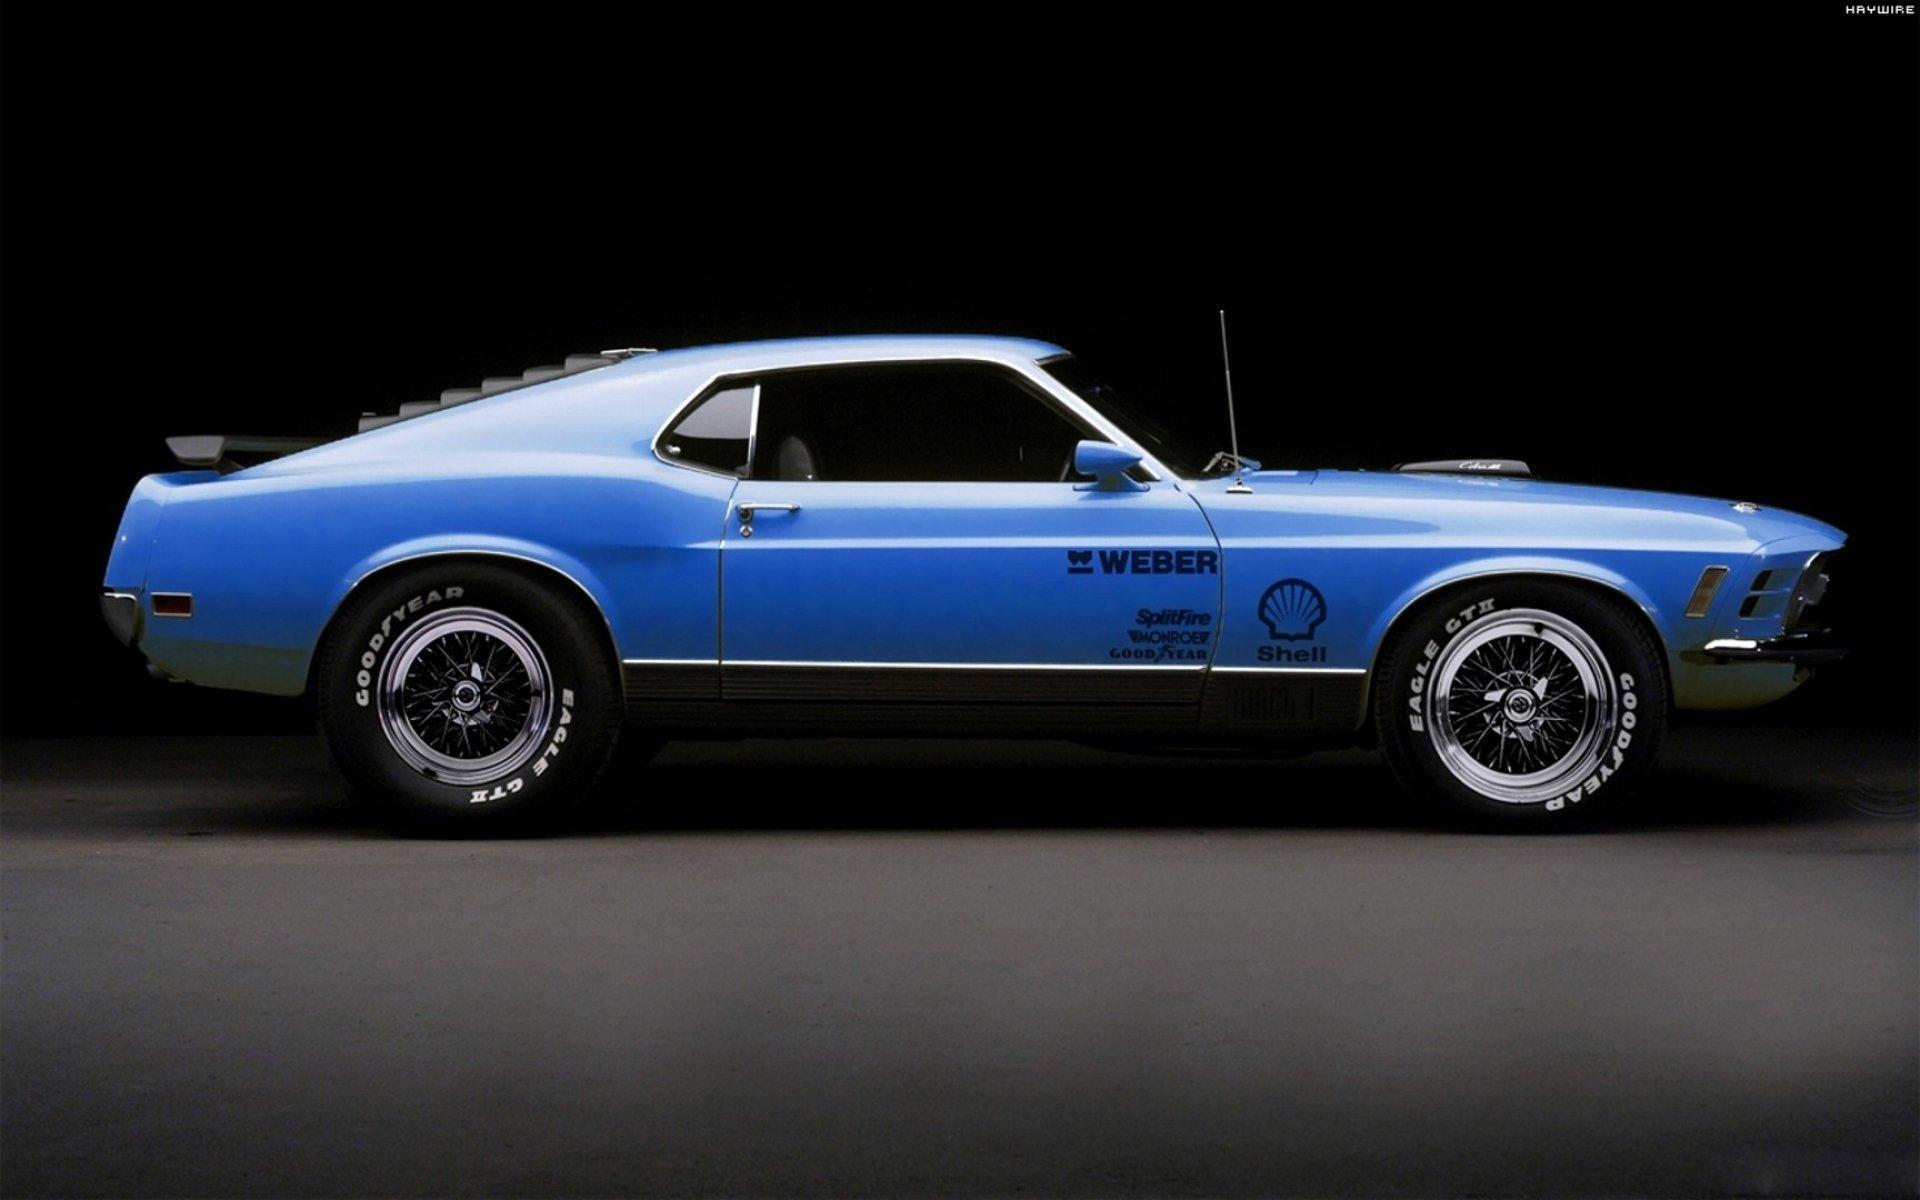 Mustang Mach 1 Wallpapers Top Free Mustang Mach 1 Backgrounds Wallpaperaccess